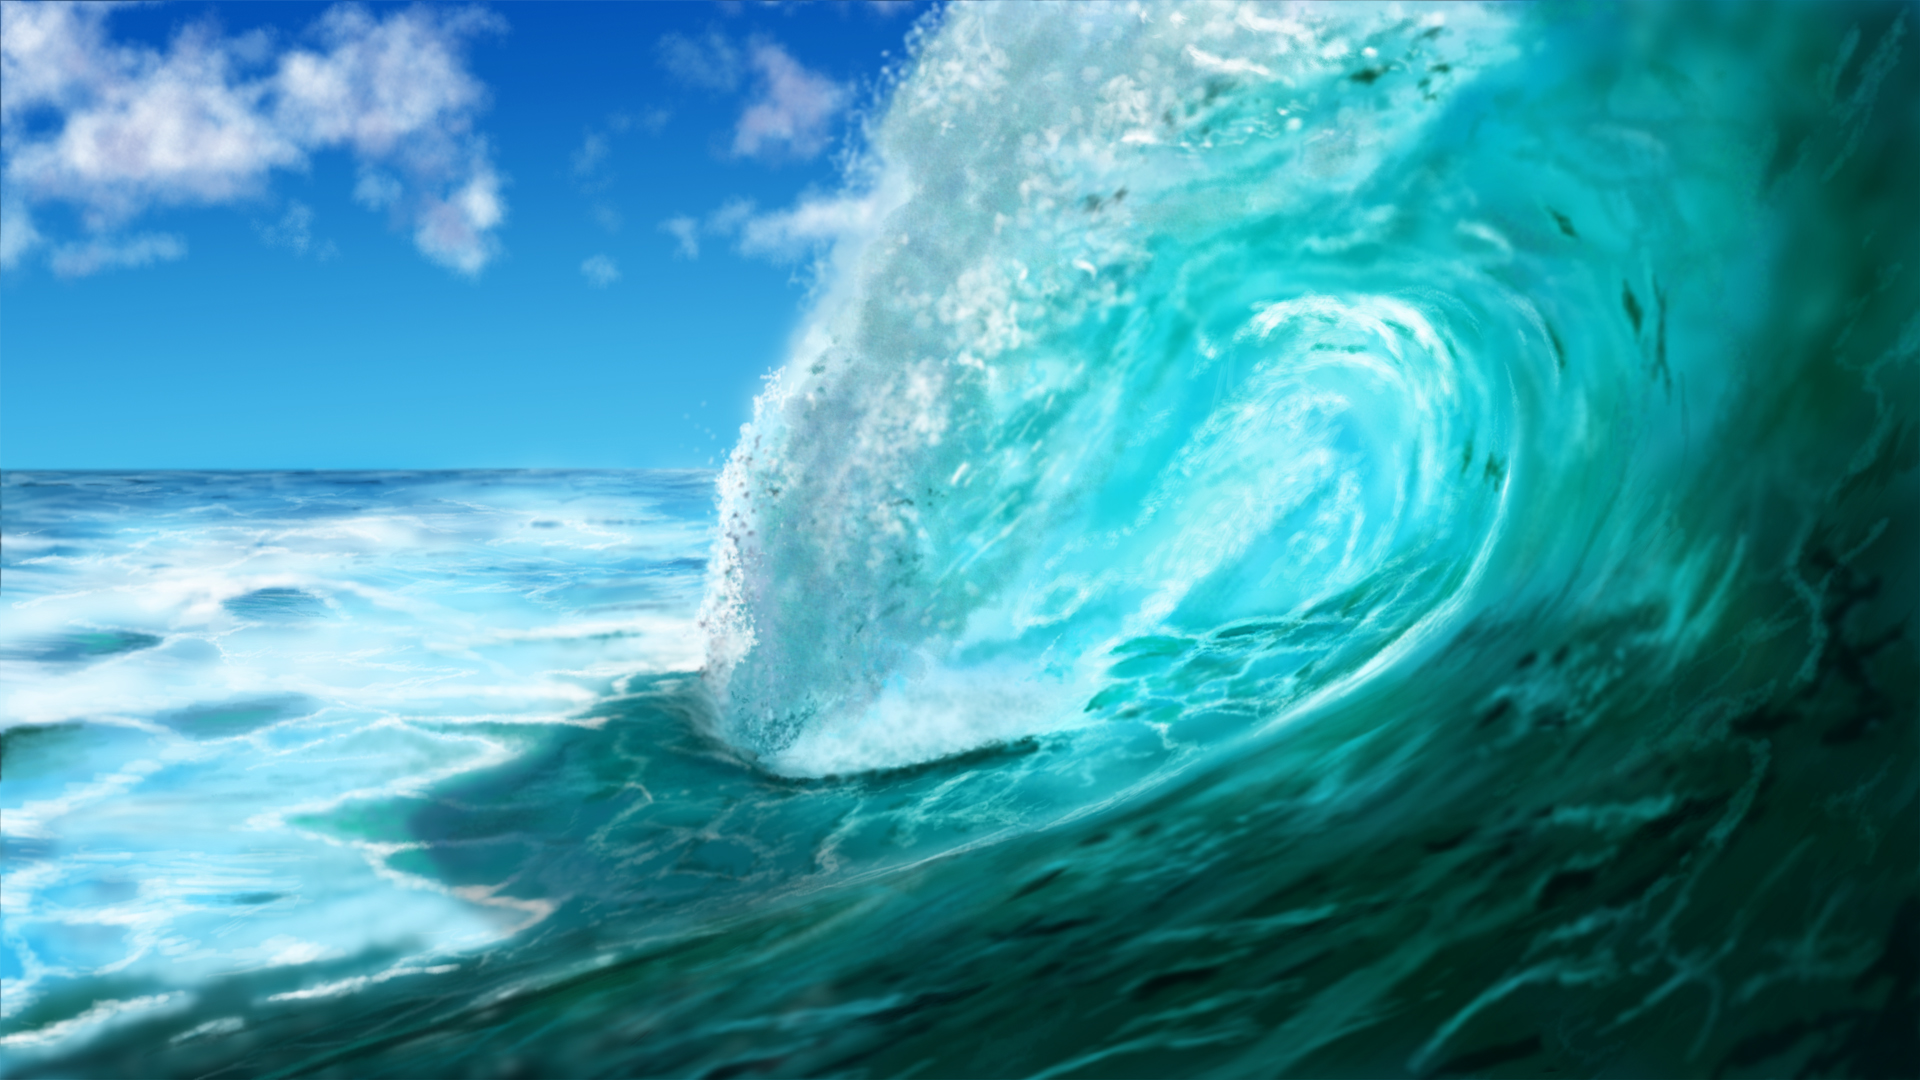 painted Wallpaper   Ocean Wave Meereswoge Welle by dasflon on 1920x1080